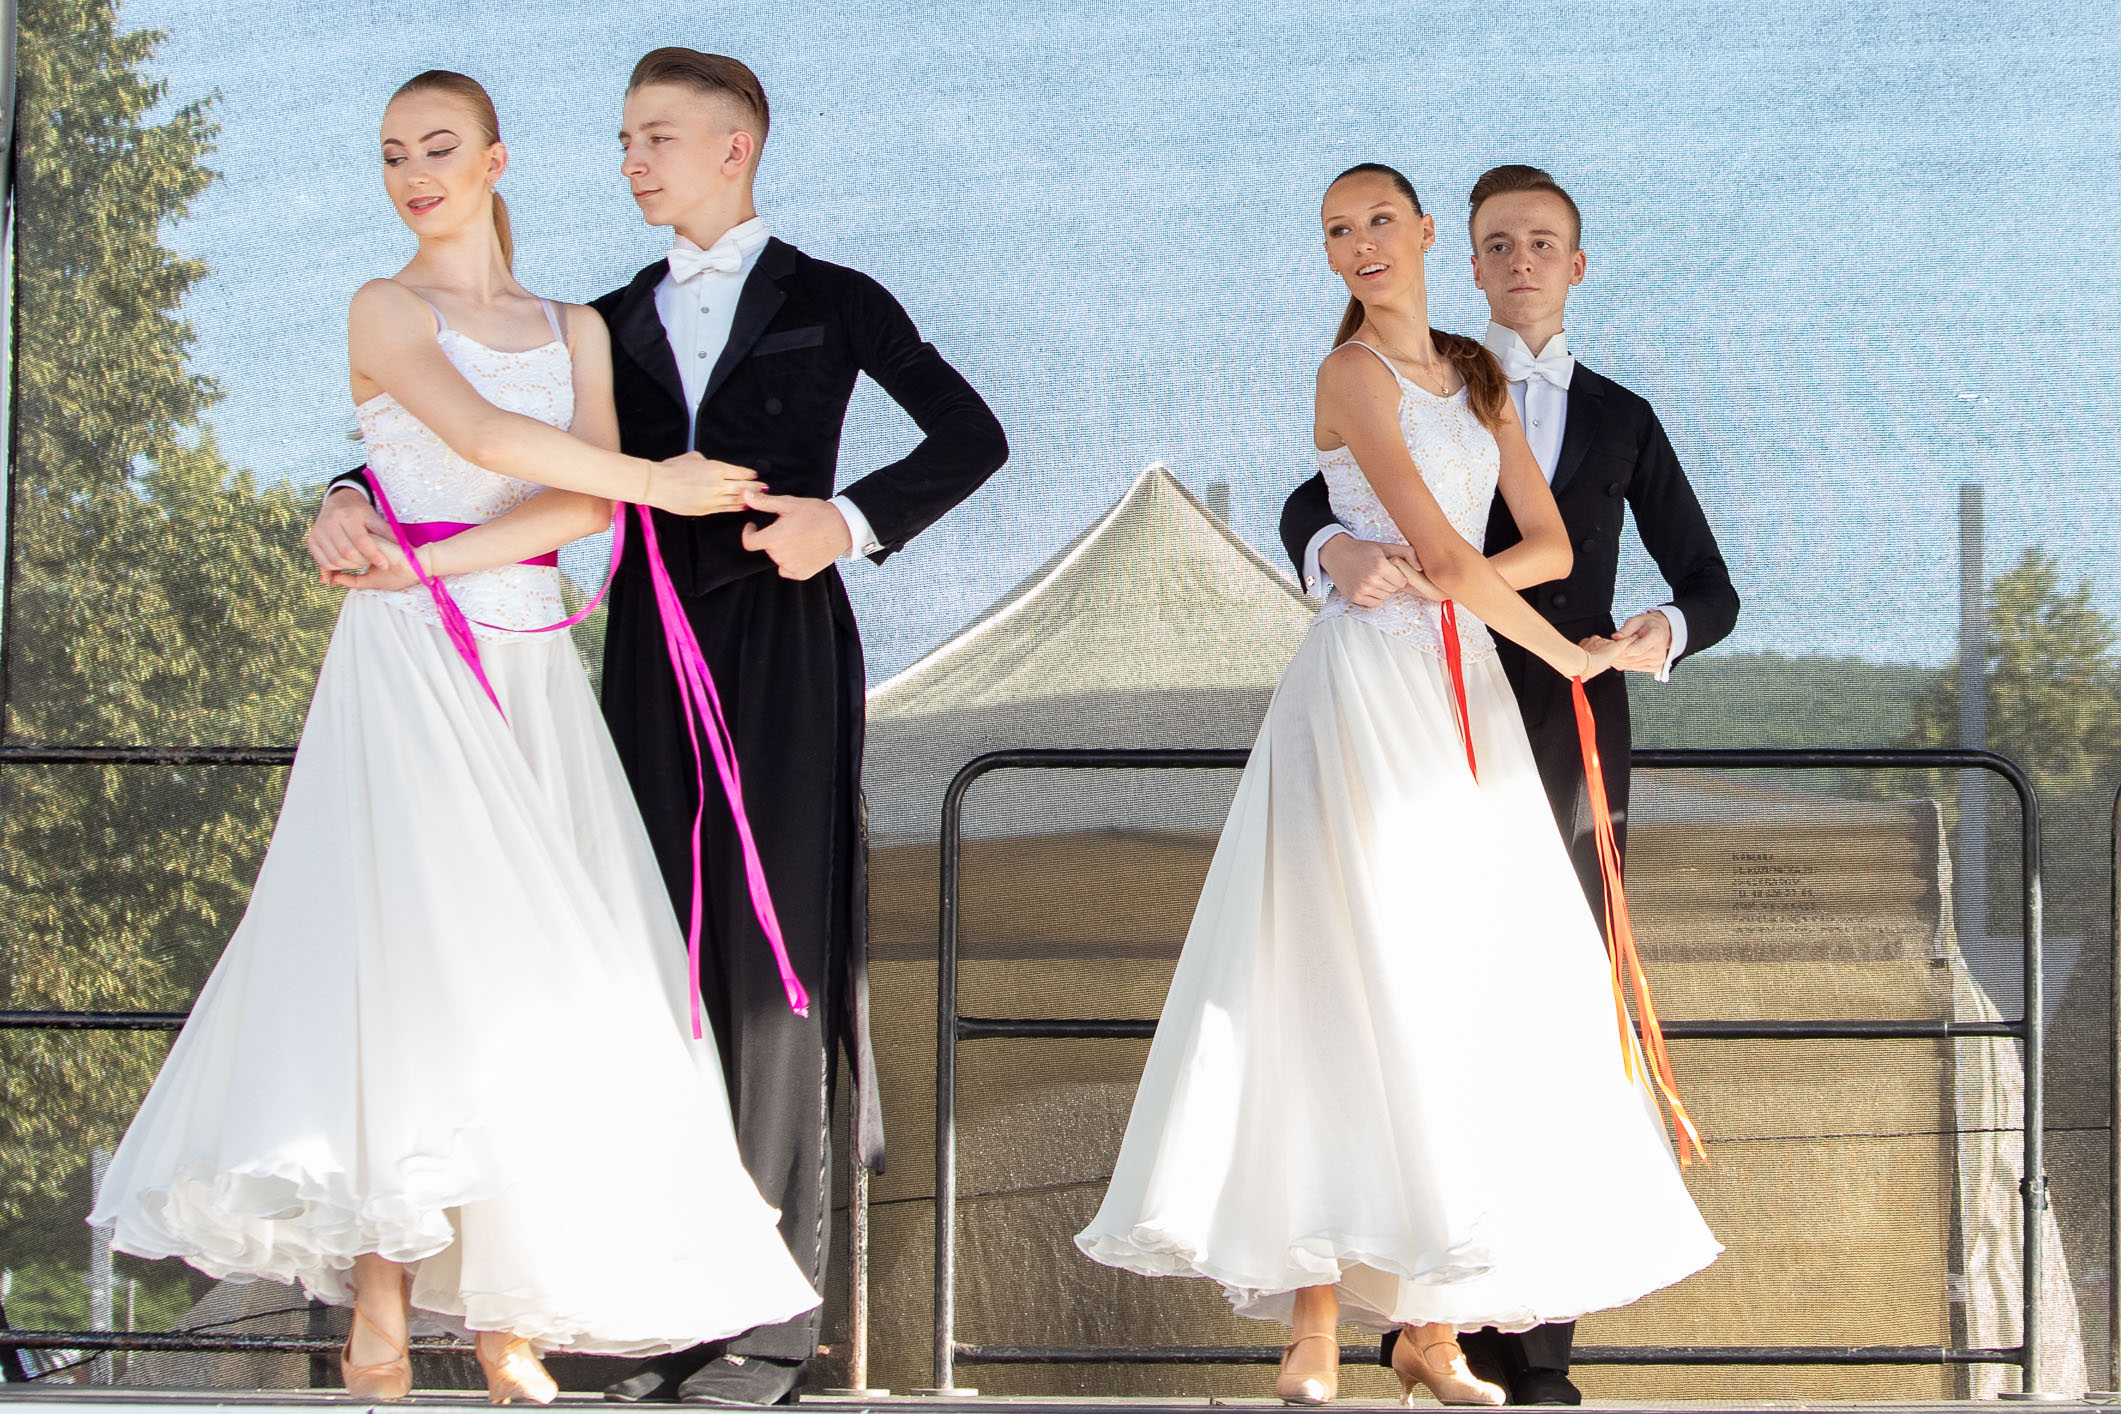 faber-dance-team-korzo-zv-3